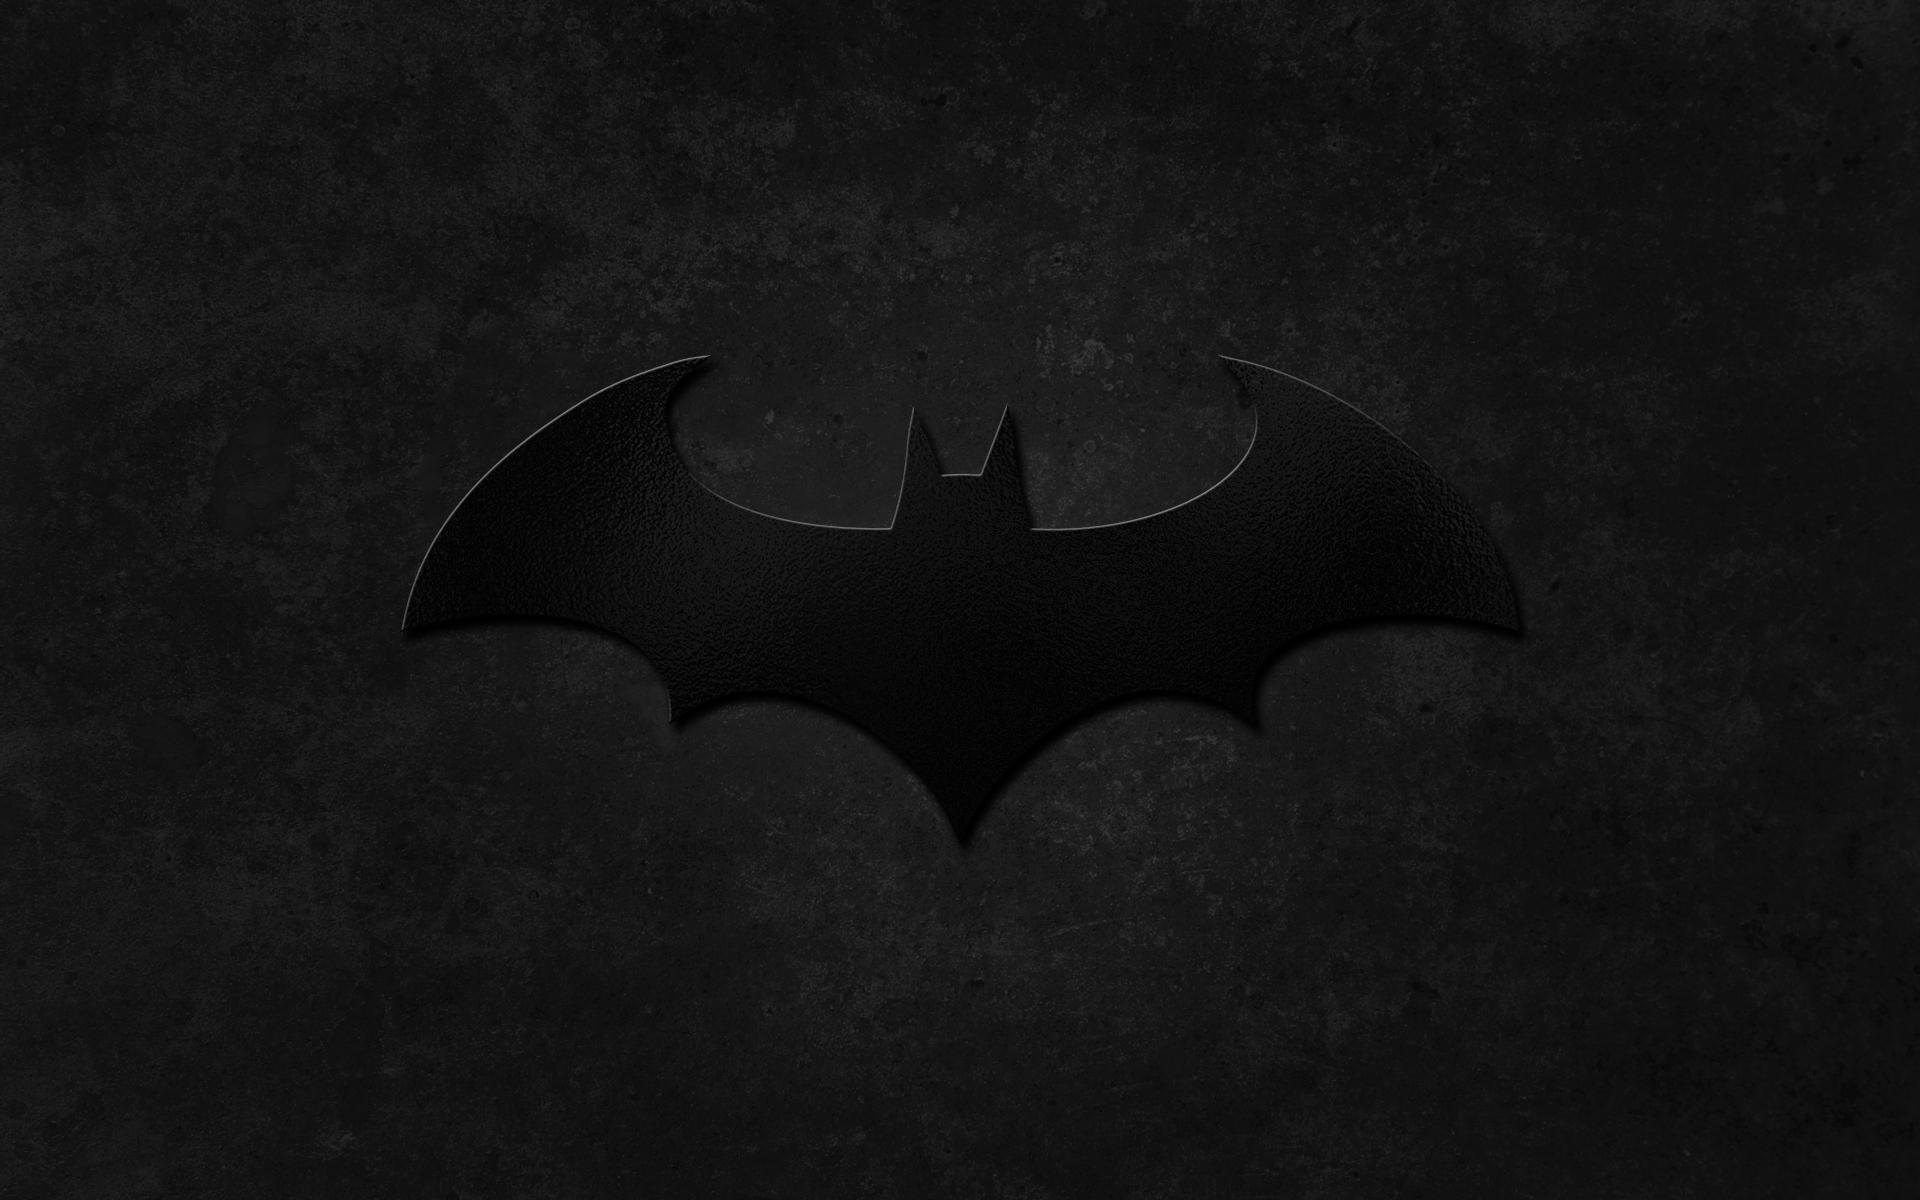 Free Batman Logo Wallpaper Download Free Clip Art Free Clip Art